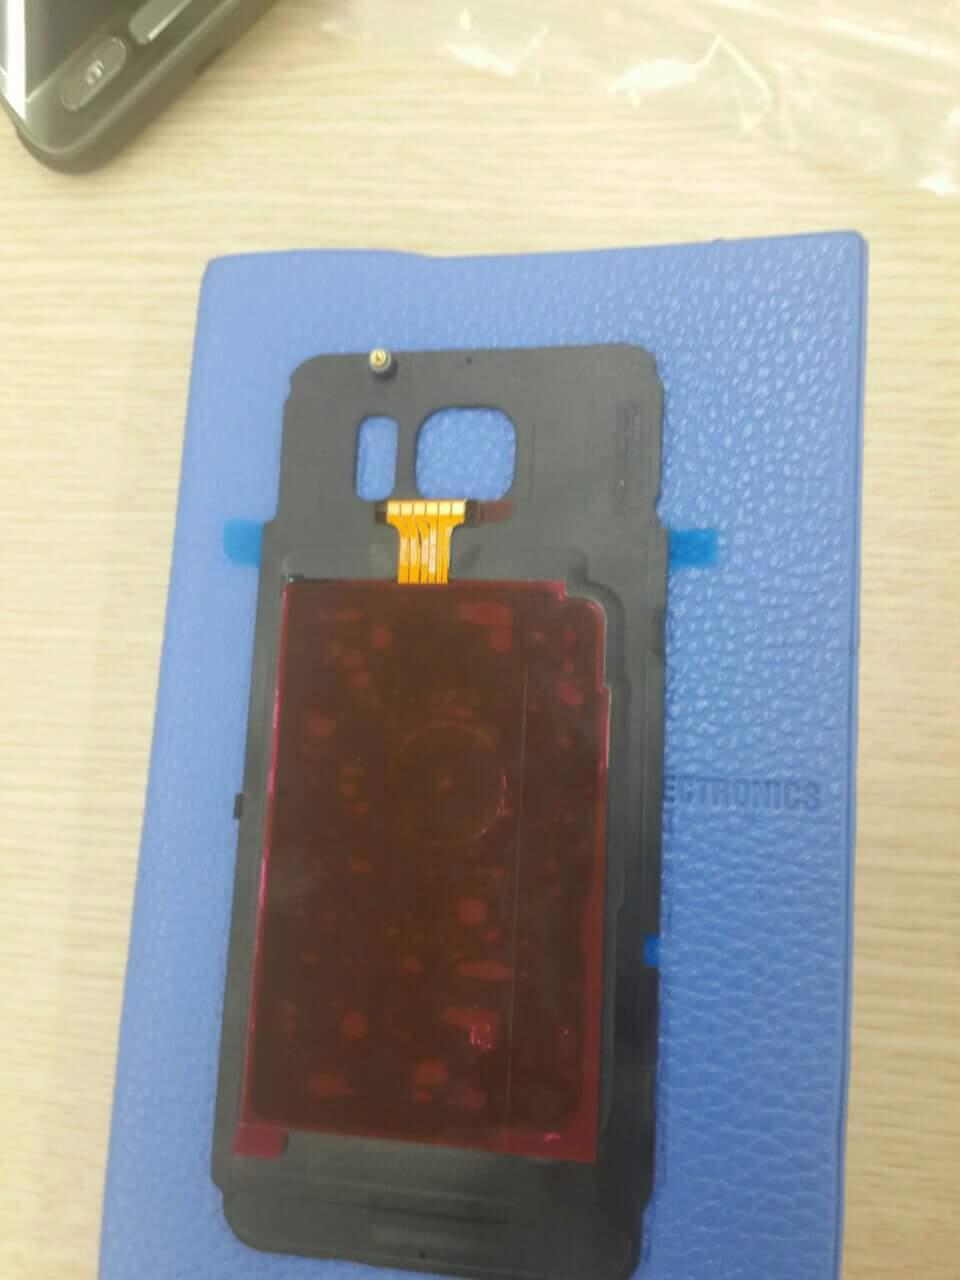 Samsung-Galaxy-S7-Active-leaked-photos (4)